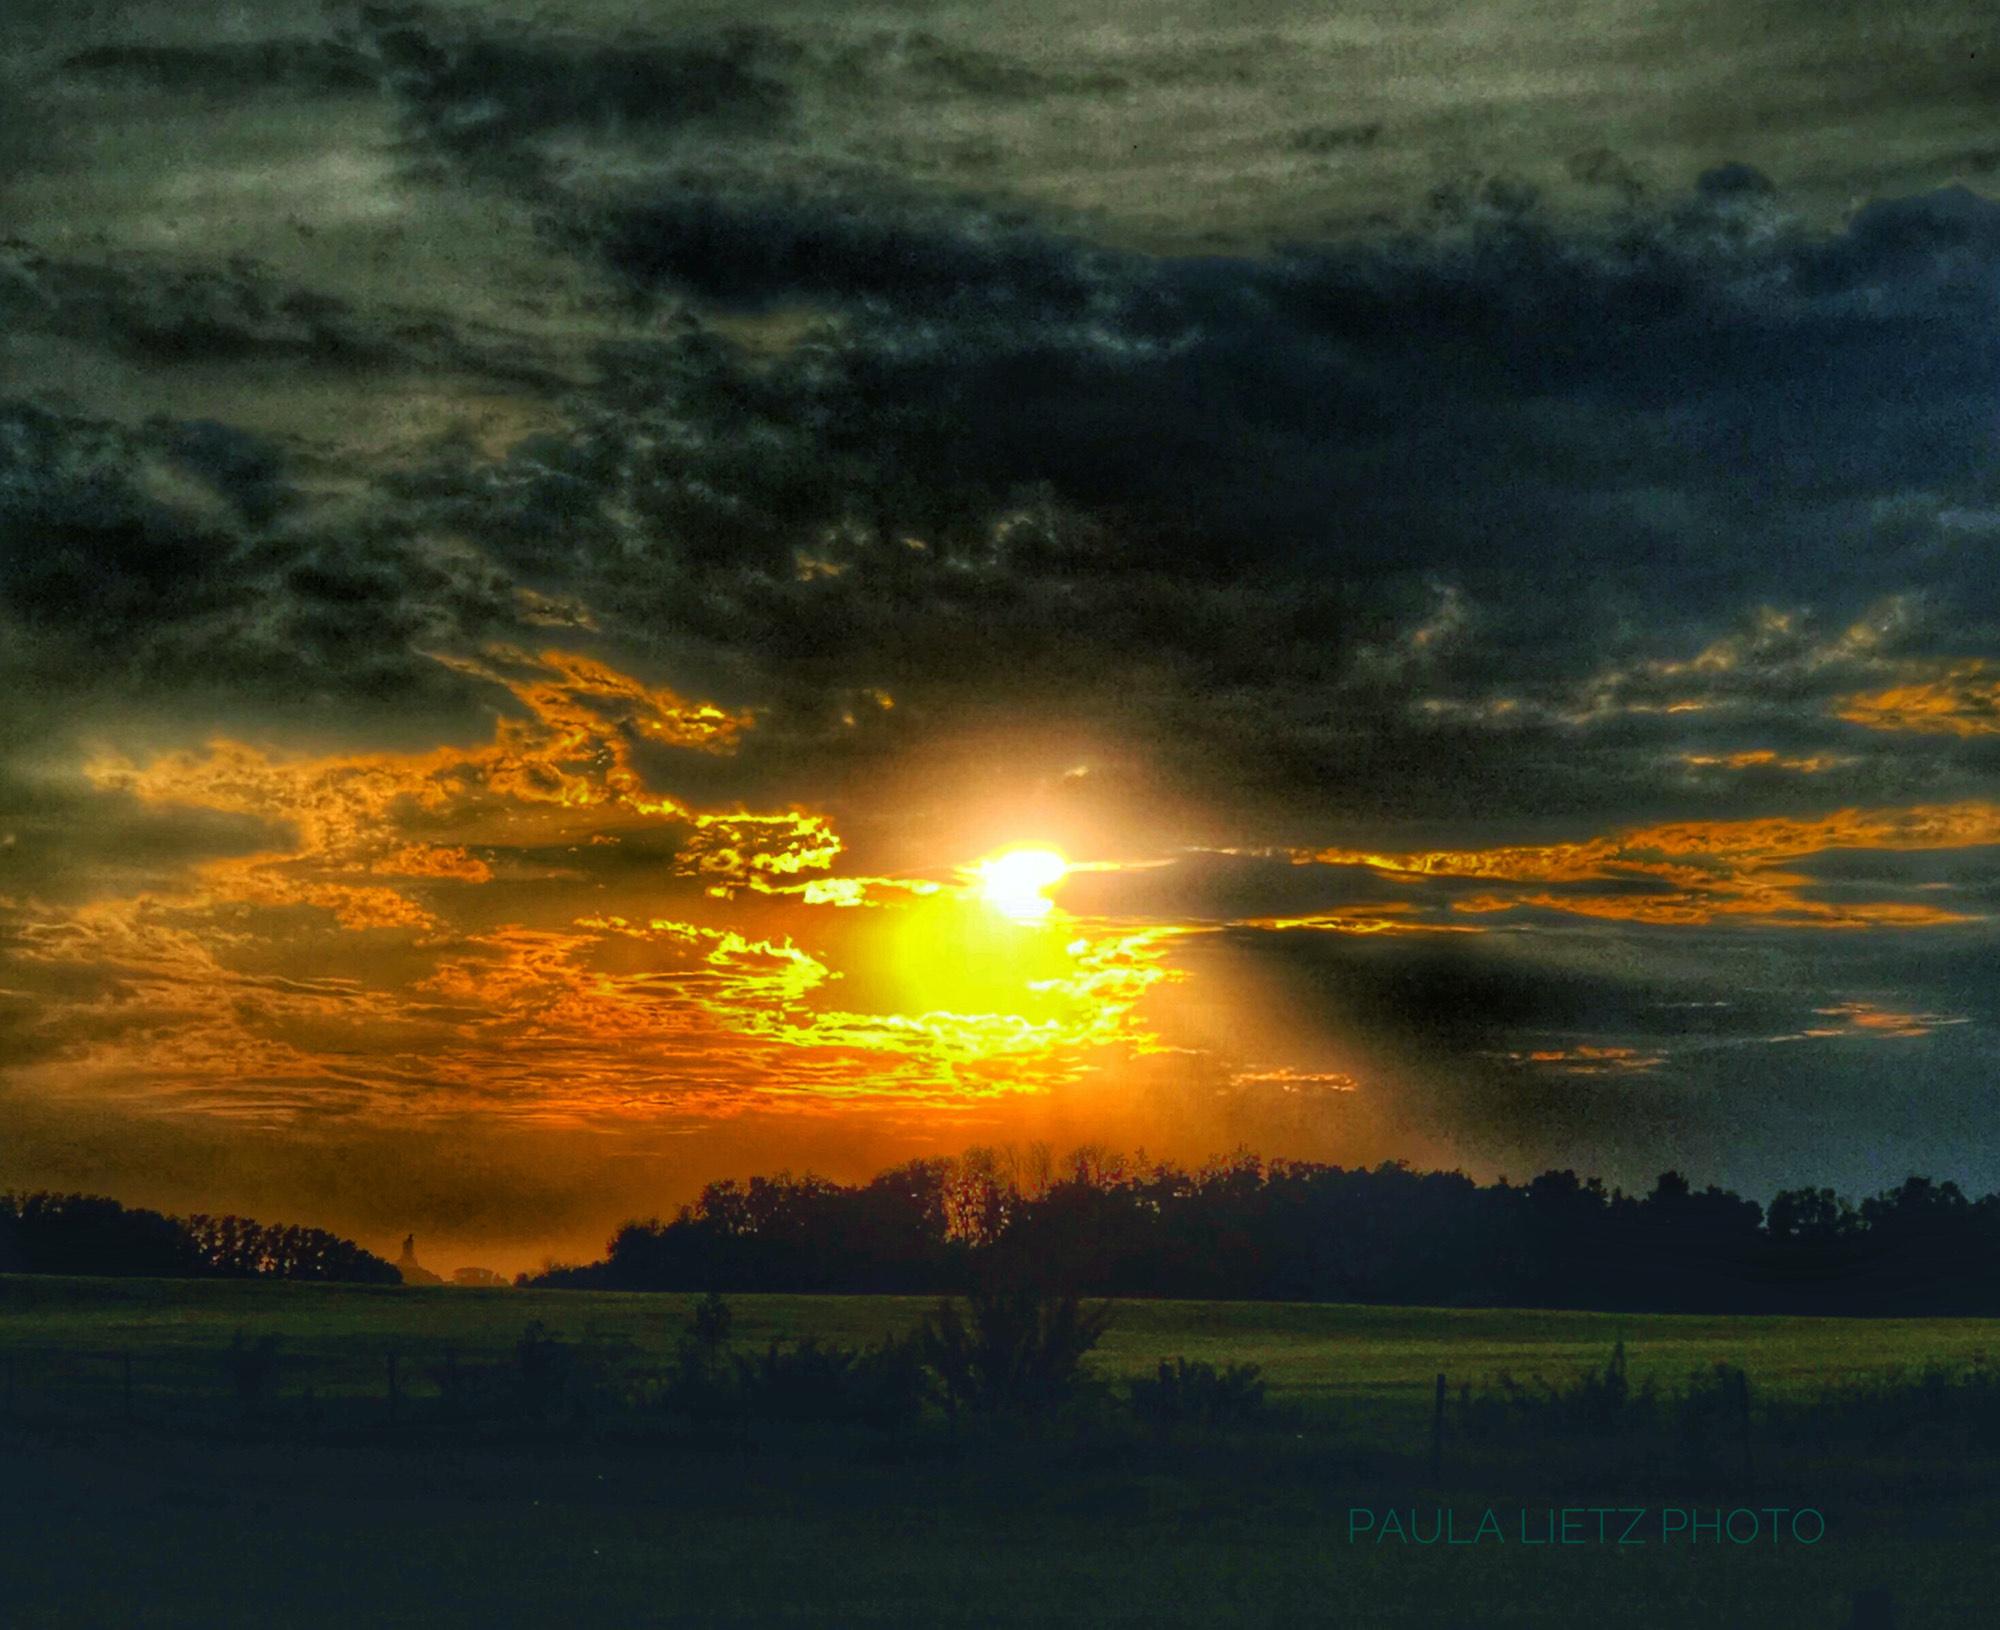 Paula Lietz meadow w sunset BHR 13